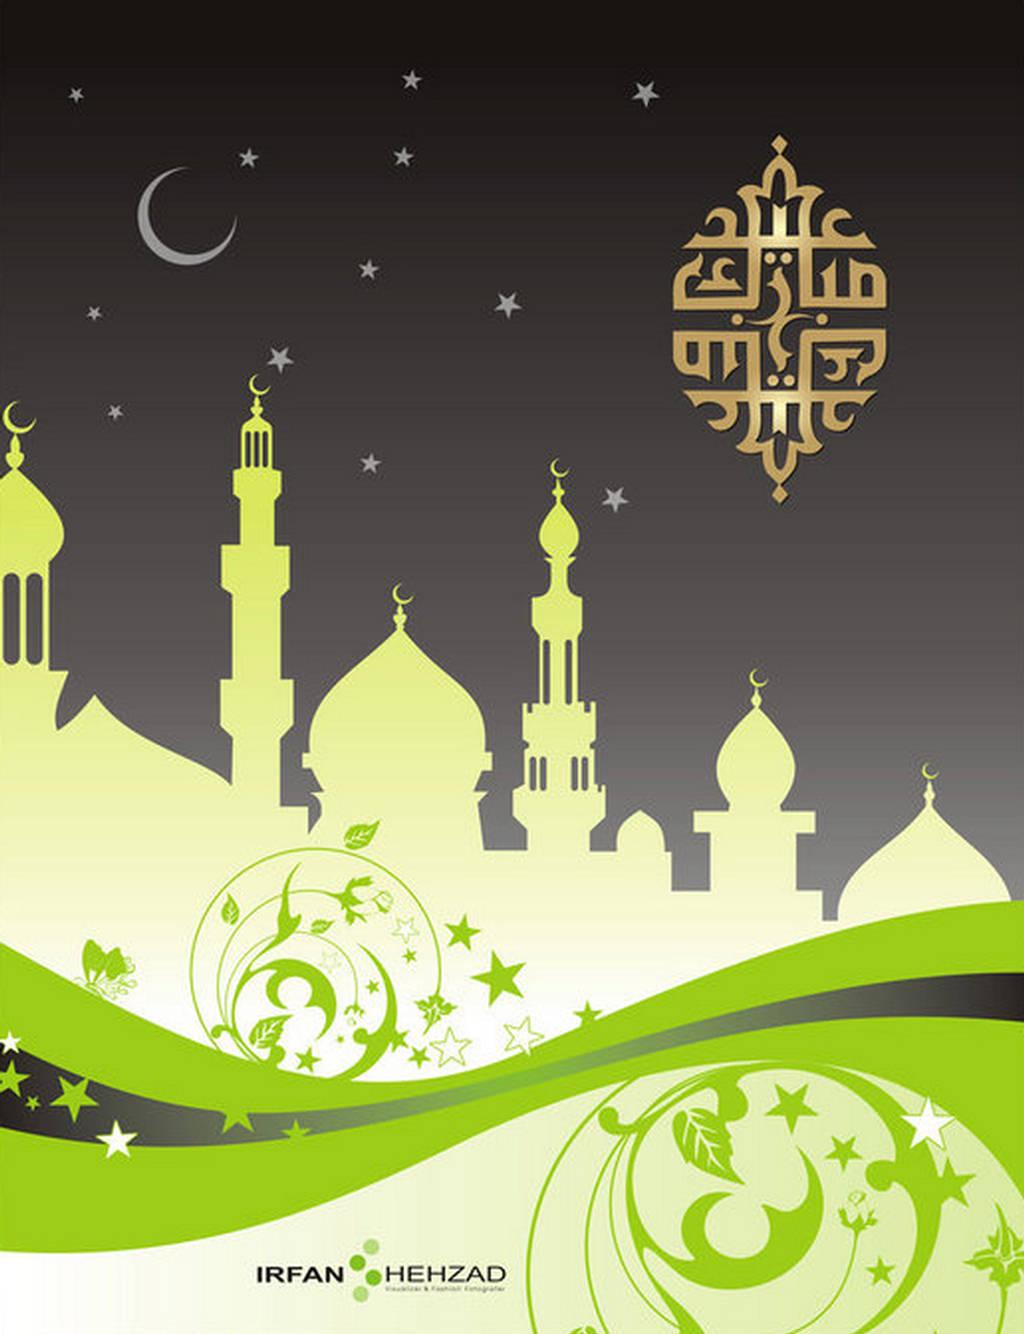 eid mubarak greeting wallpapers  eid cards 2012